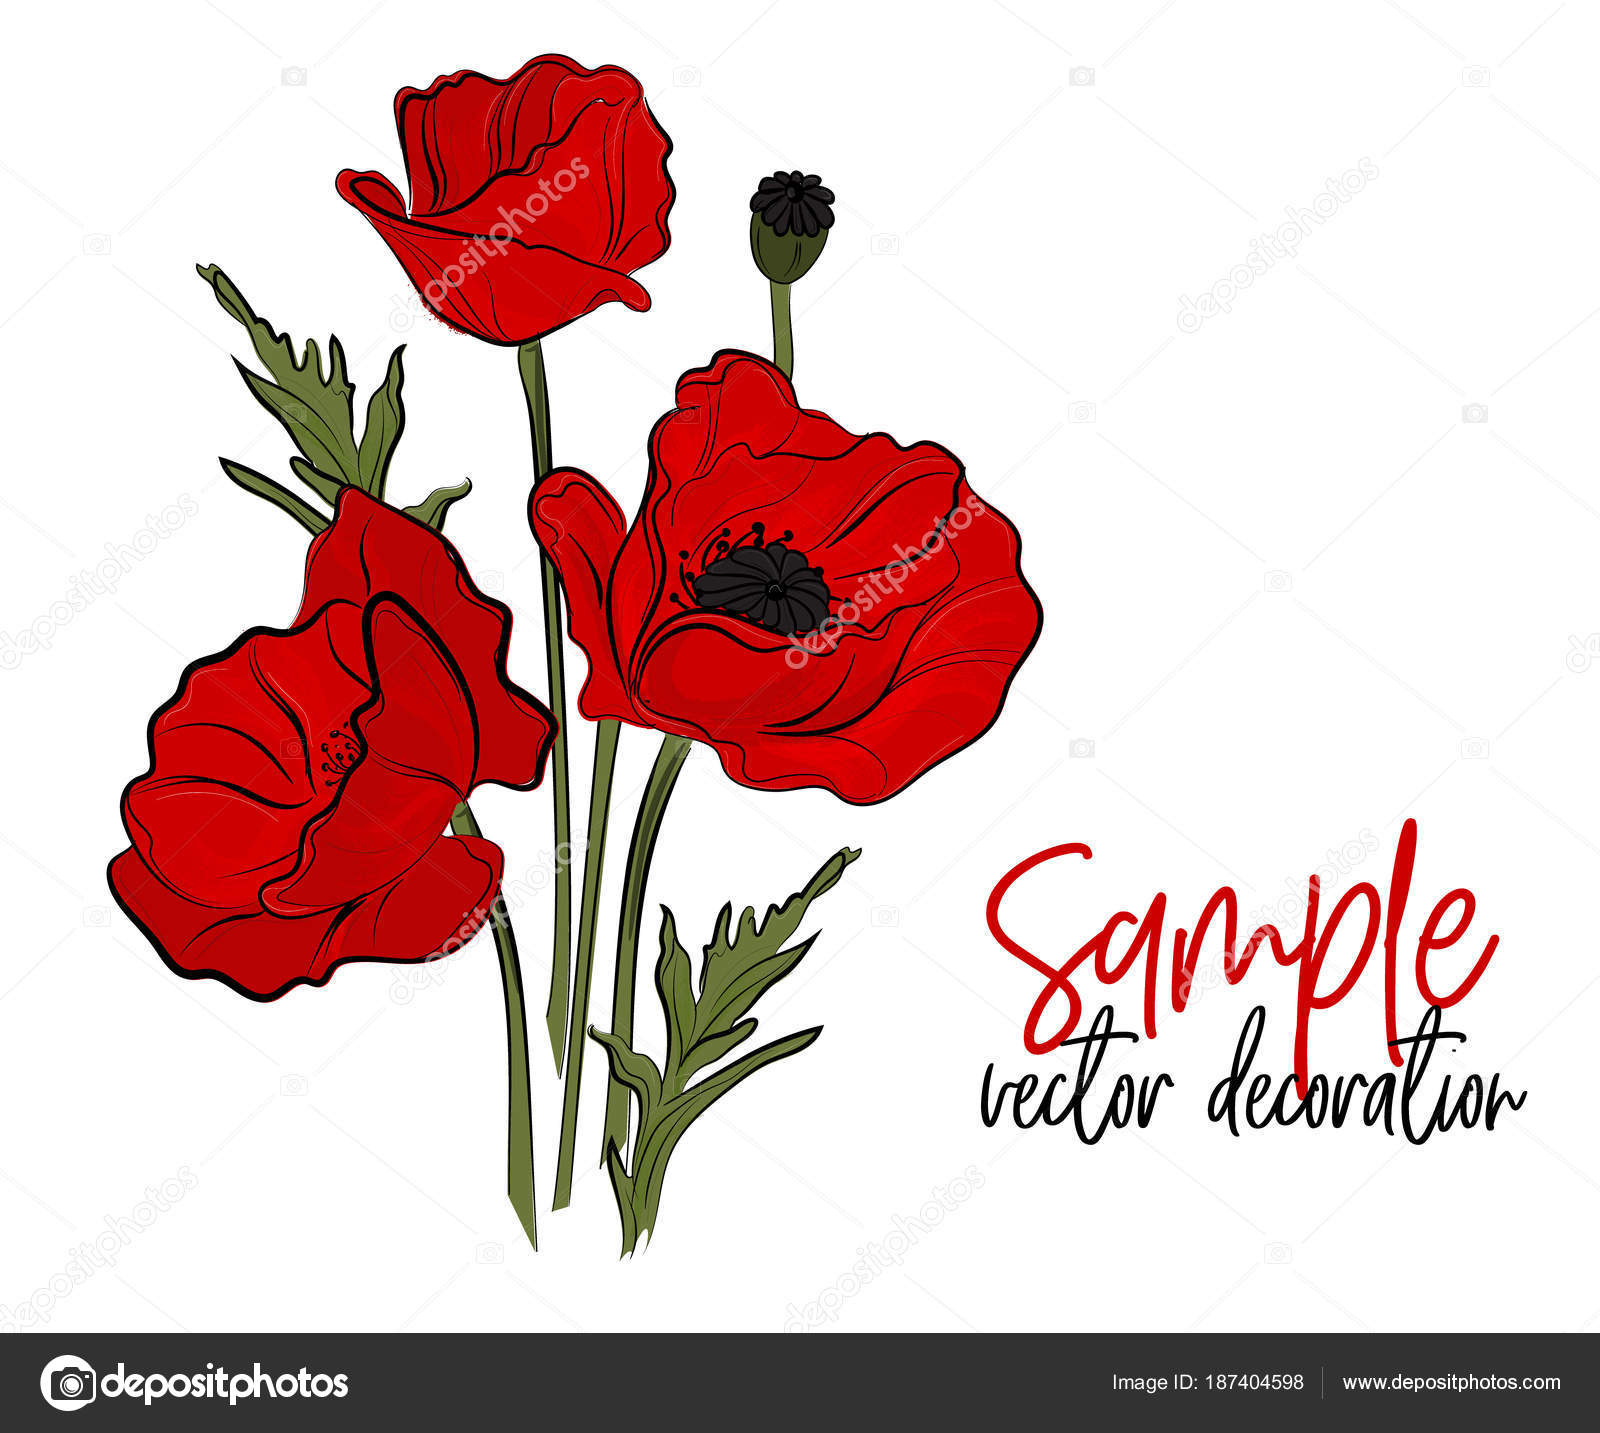 Vector red poppies flowers bloom symbol of spring botany vector red poppies flowers bloom symbol of spring botany illustration opium season holiday mightylinksfo